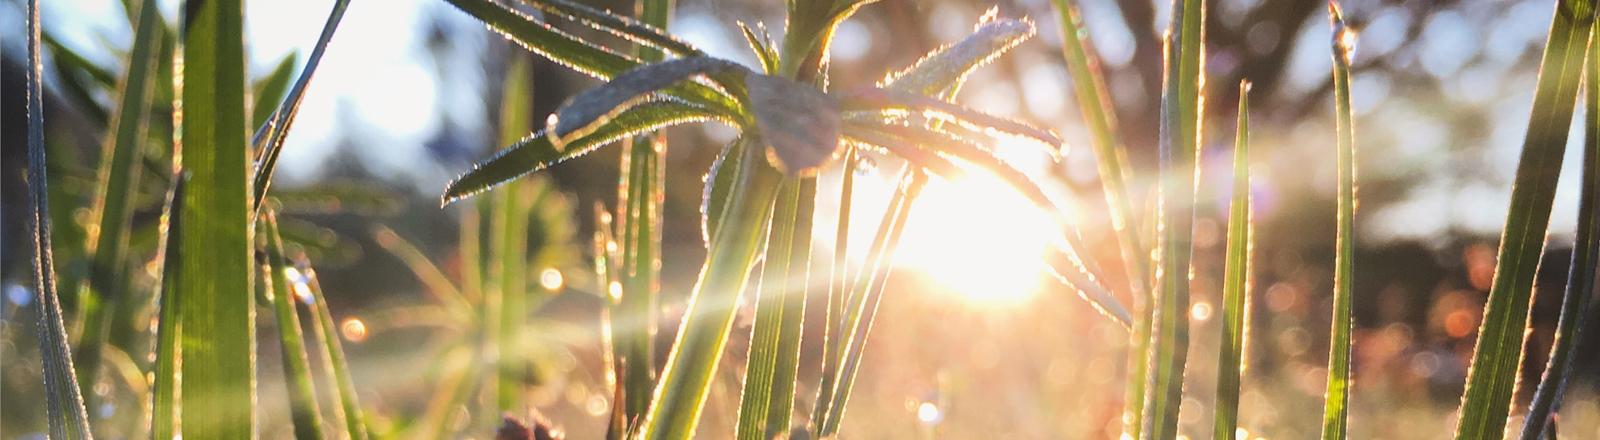 Blick auf grüne Gräser